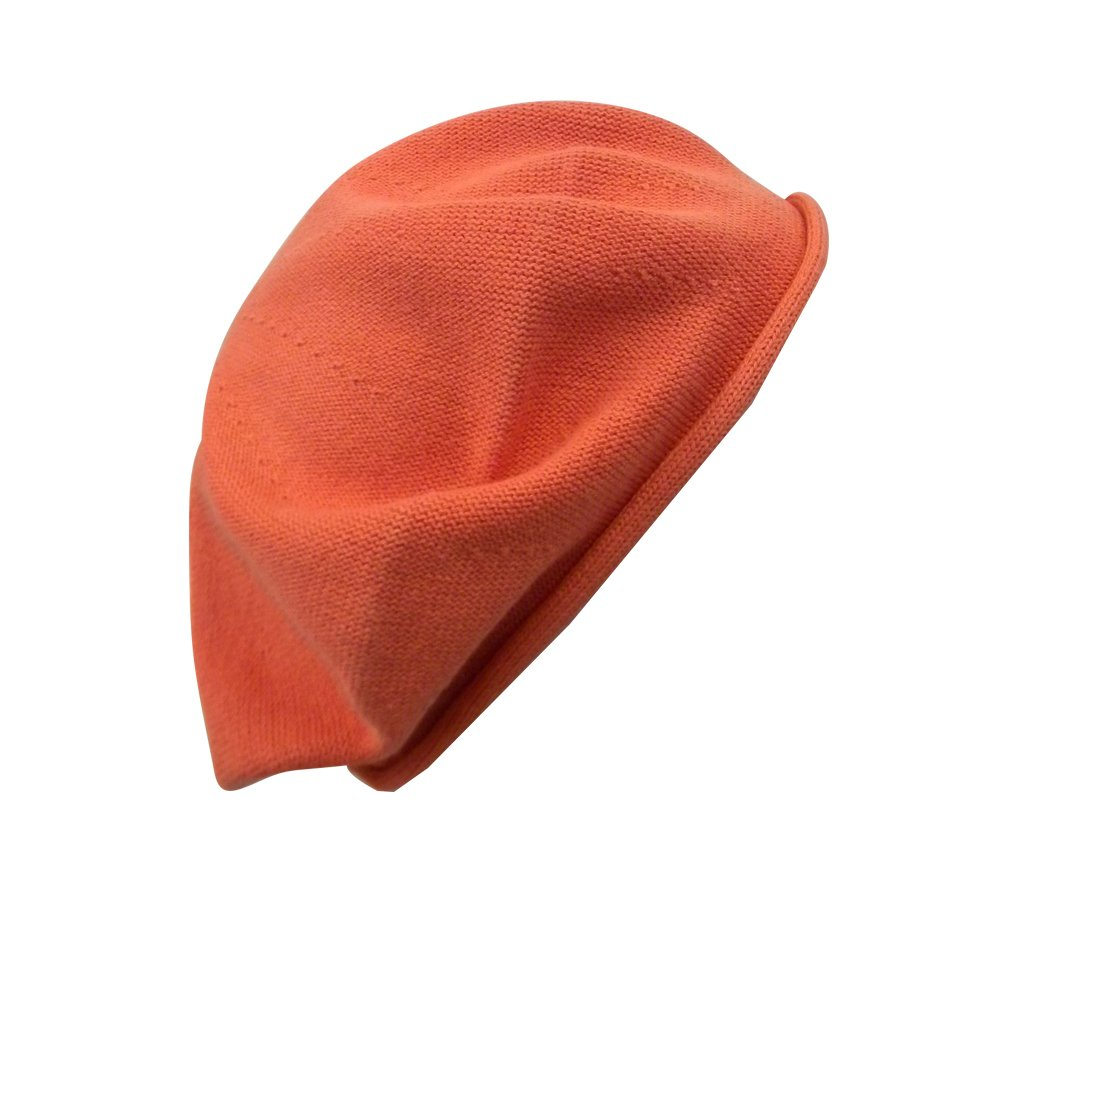 Landana Headscarves Beret for Women 100% Cotton Solid ldbt-cotton-AquaRegular